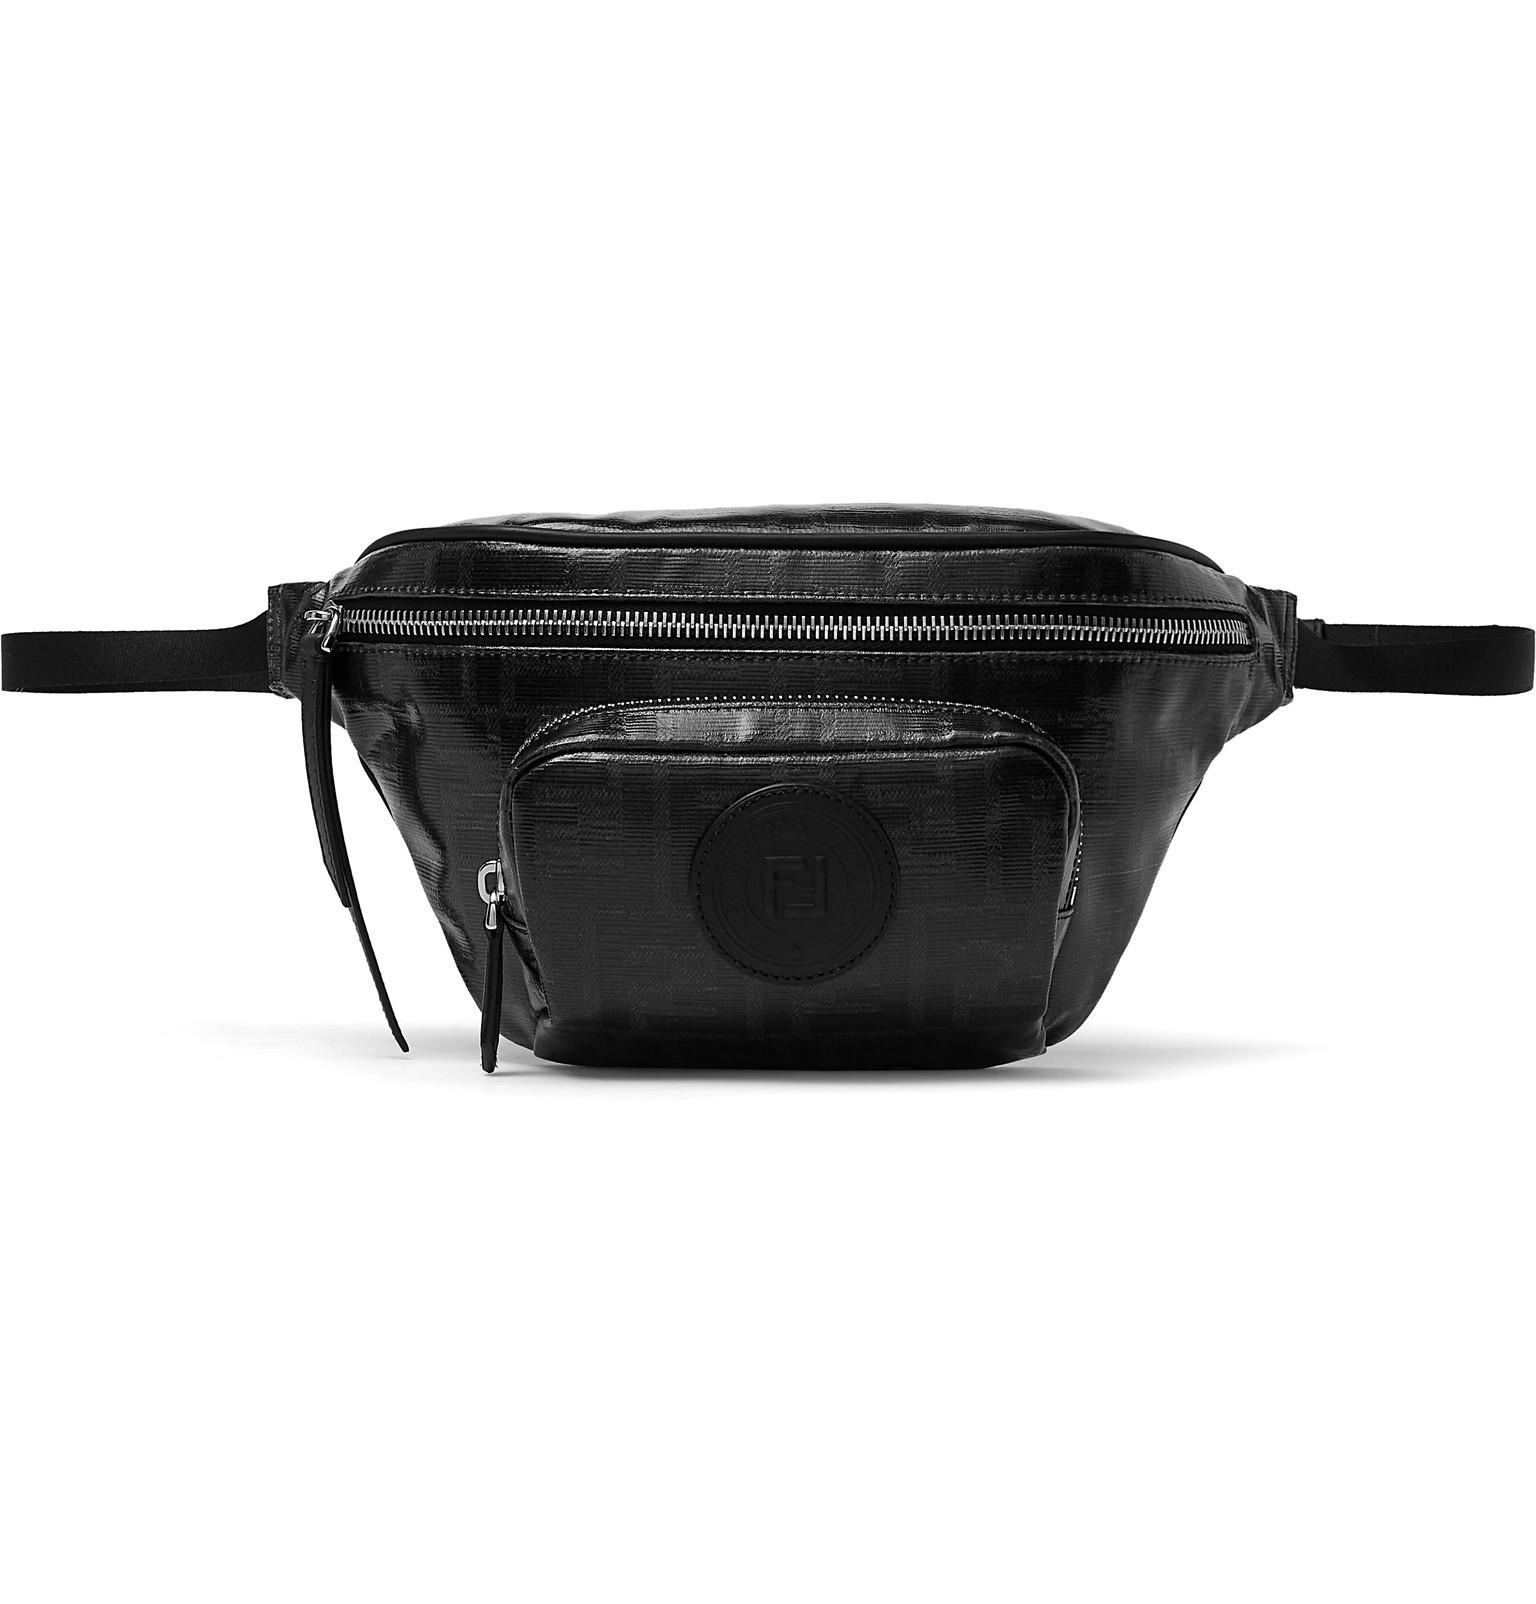 Lyst - Fendi Leather-trimmed Logo-print Coated-canvas Belt Bag in ... fff0f4d75b37b